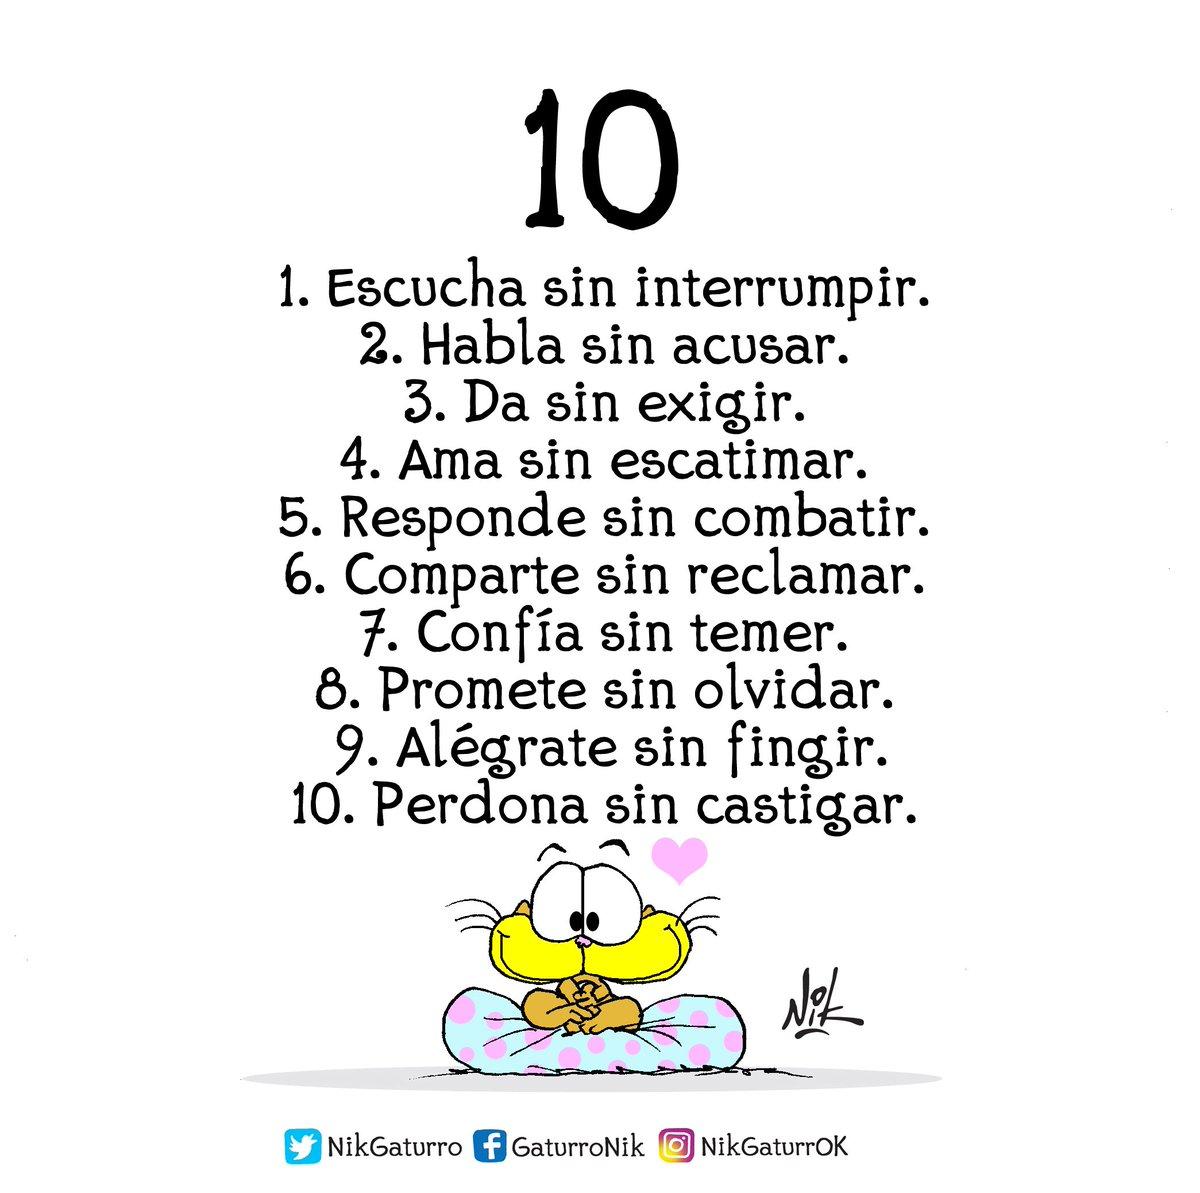 10 #BuenViernes #QuieroVivirATuLado https://t.co/rDENtuTAq5